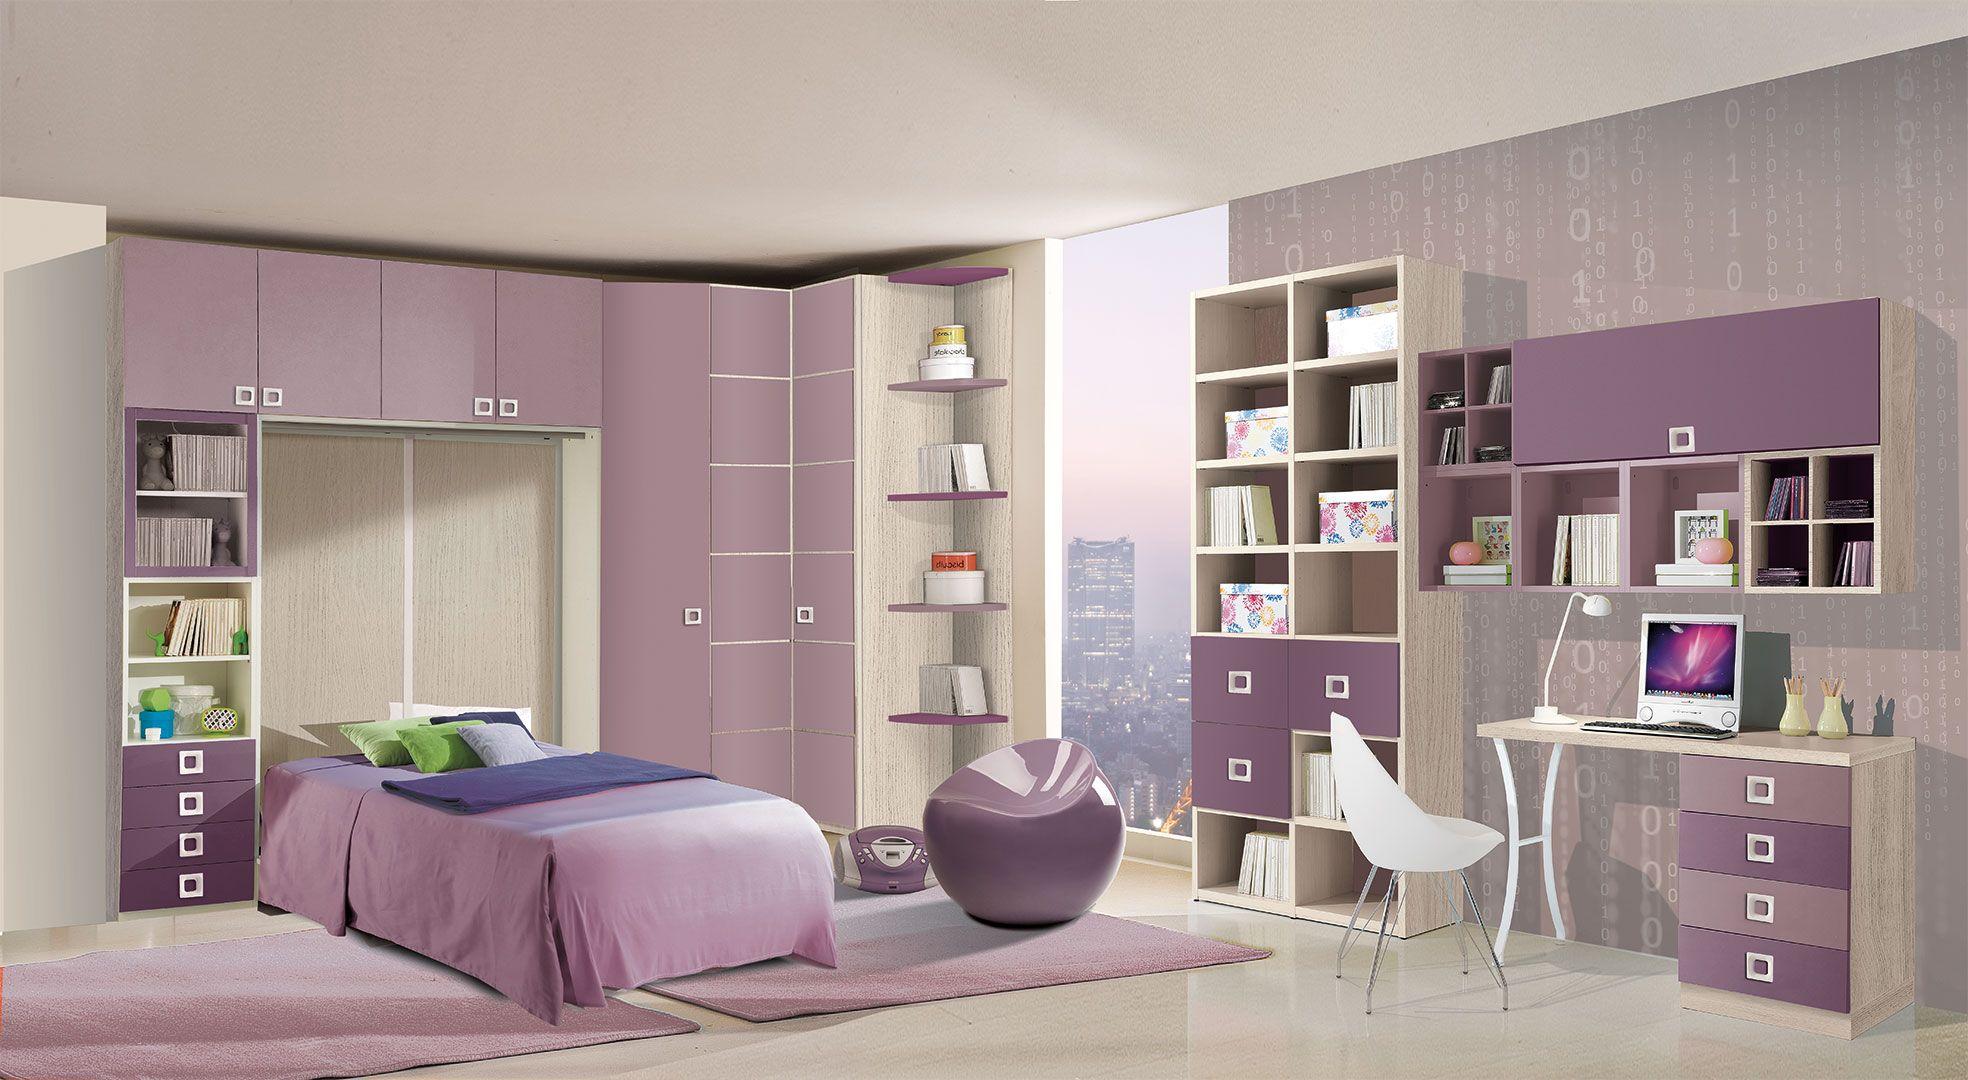 Cameretta Trasformabile - CM54 - Giessegi | Bedroom kids | Pinterest ...